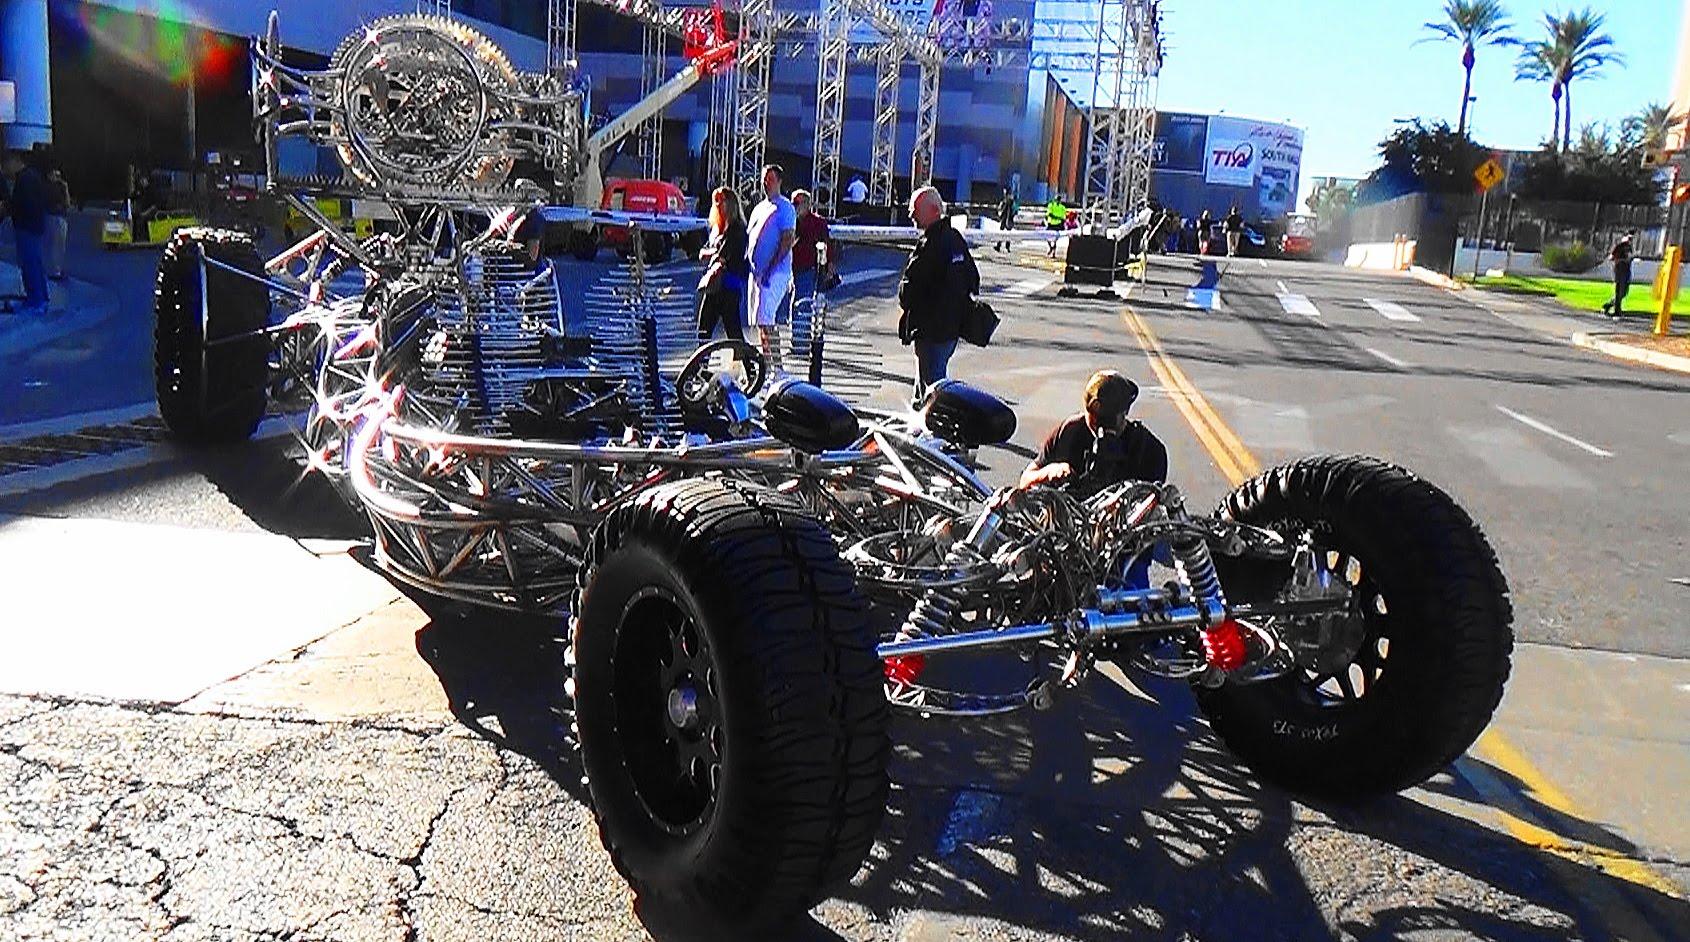 Mad Max Machine SEMA 2015 - ScottieDTV - Coolest Cars On ...